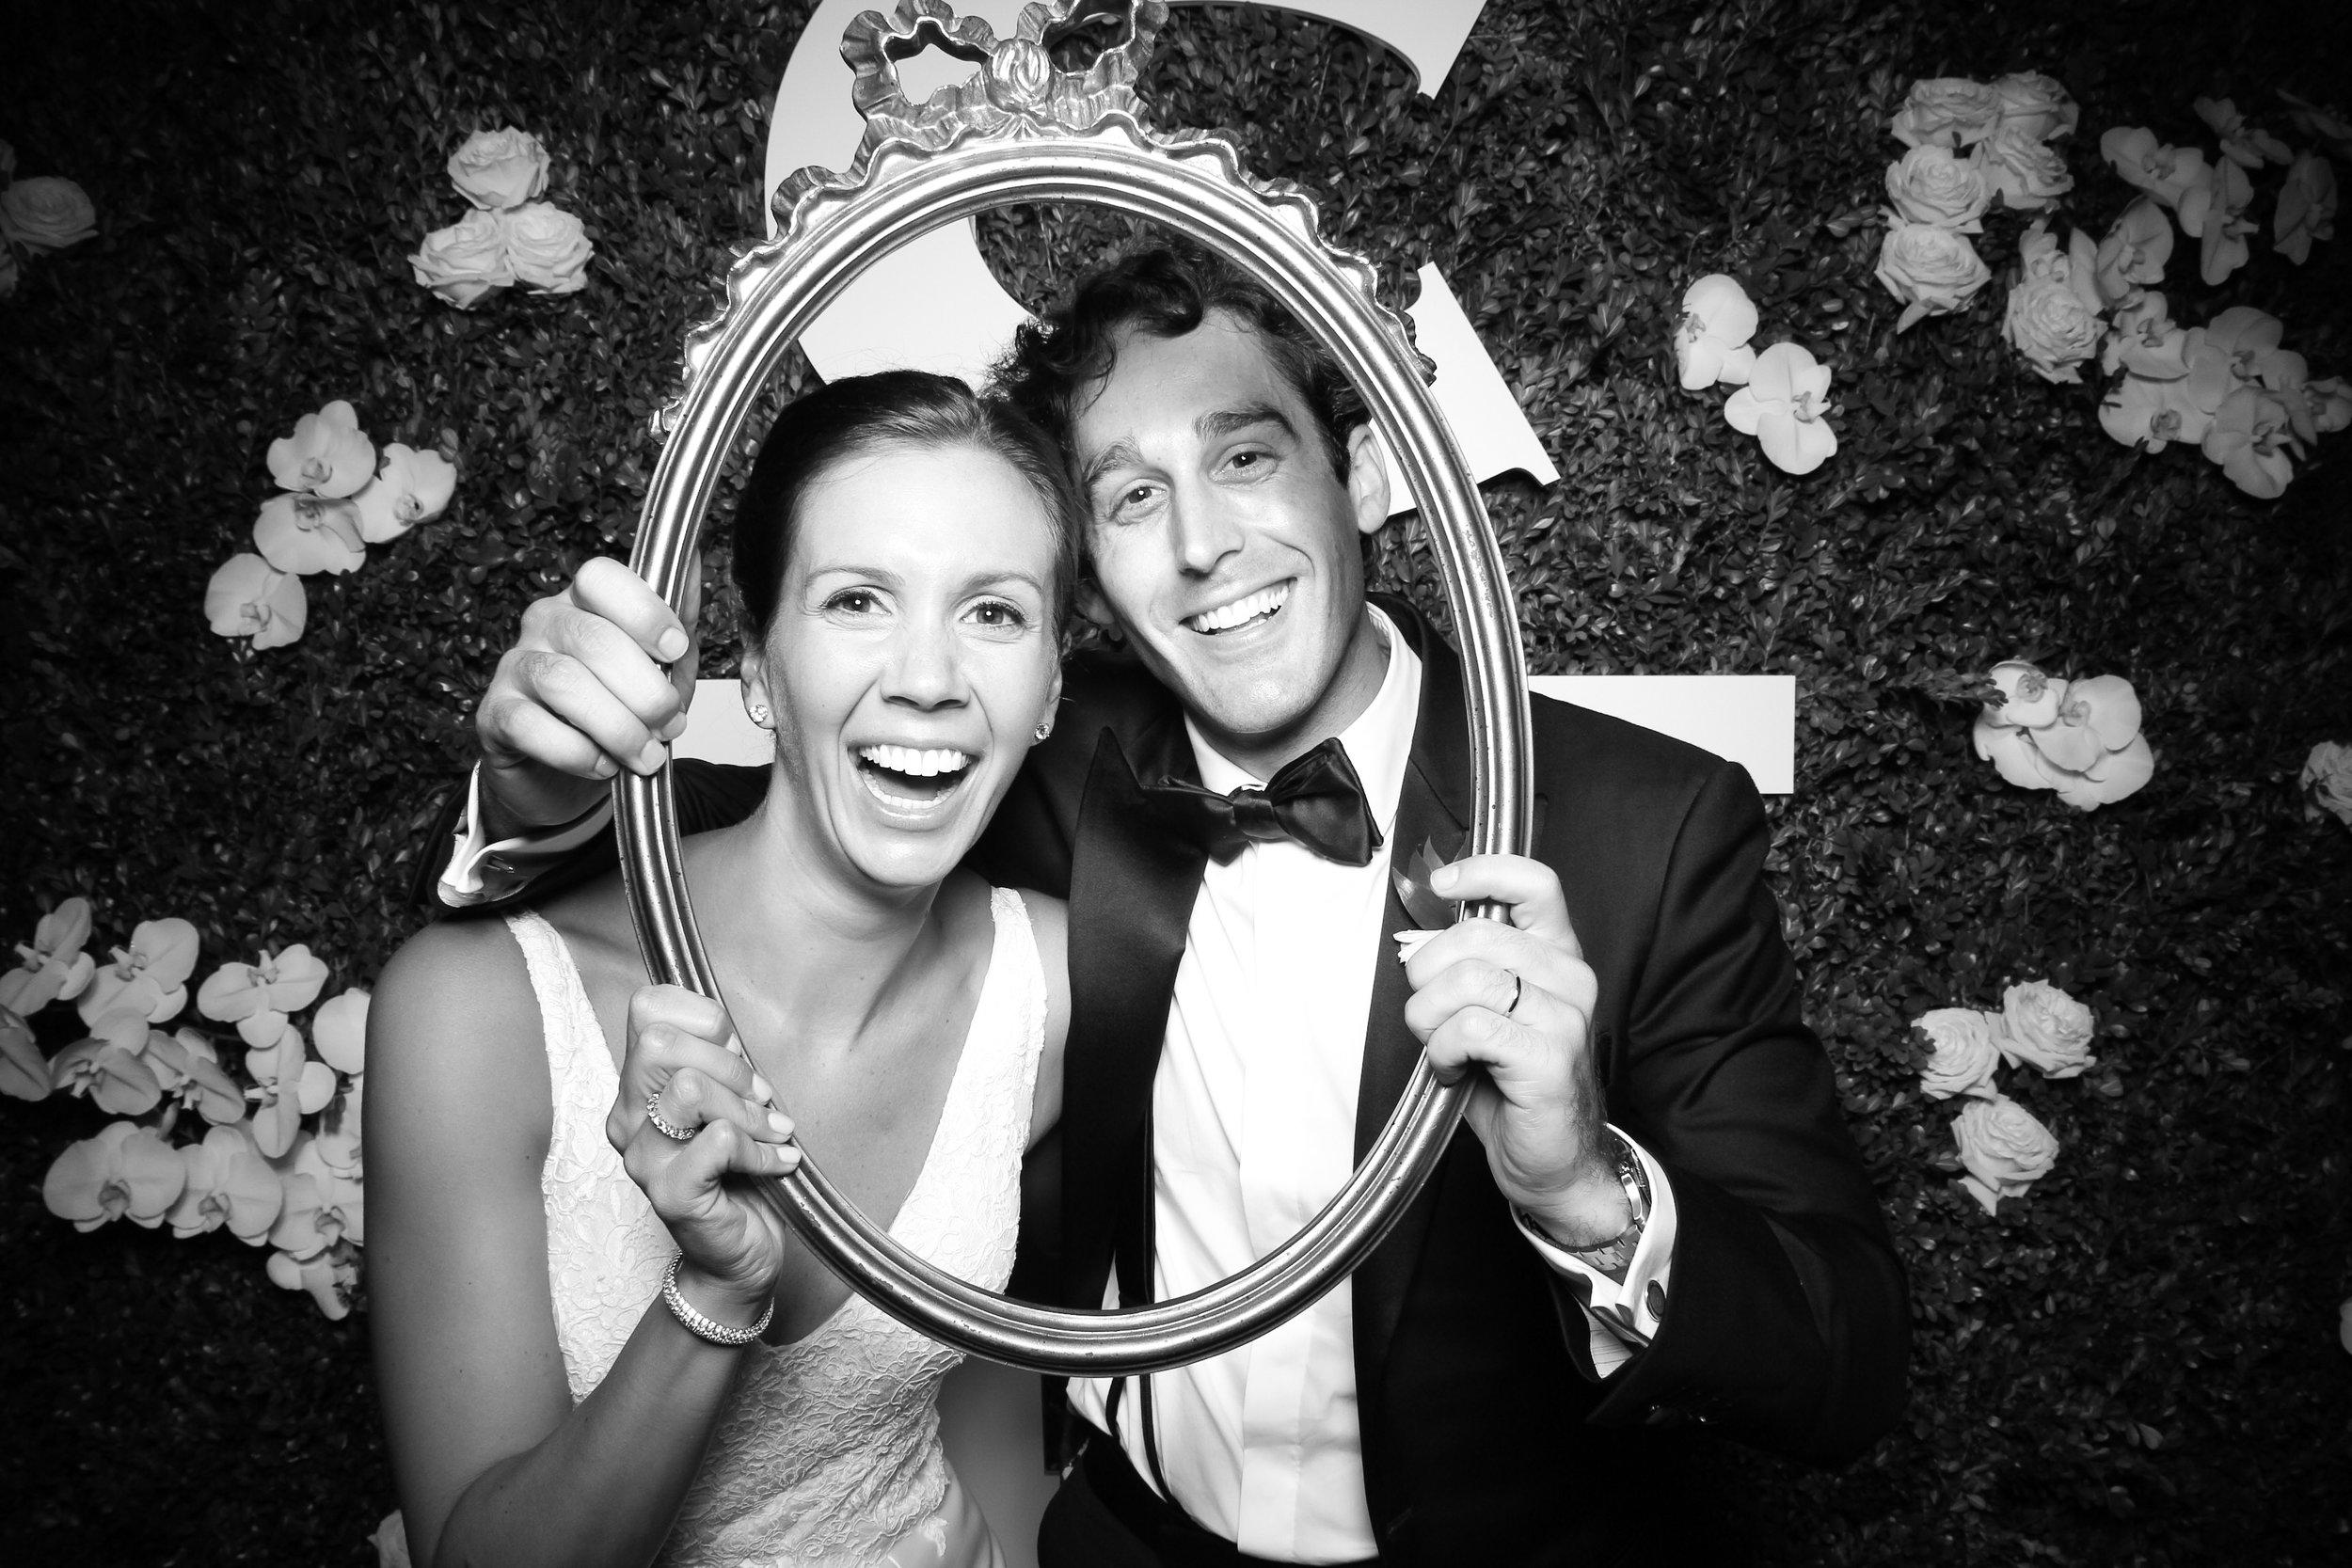 Peninsula_Hotel_Chicago_Wedding_Photo_Booth_15.jpg